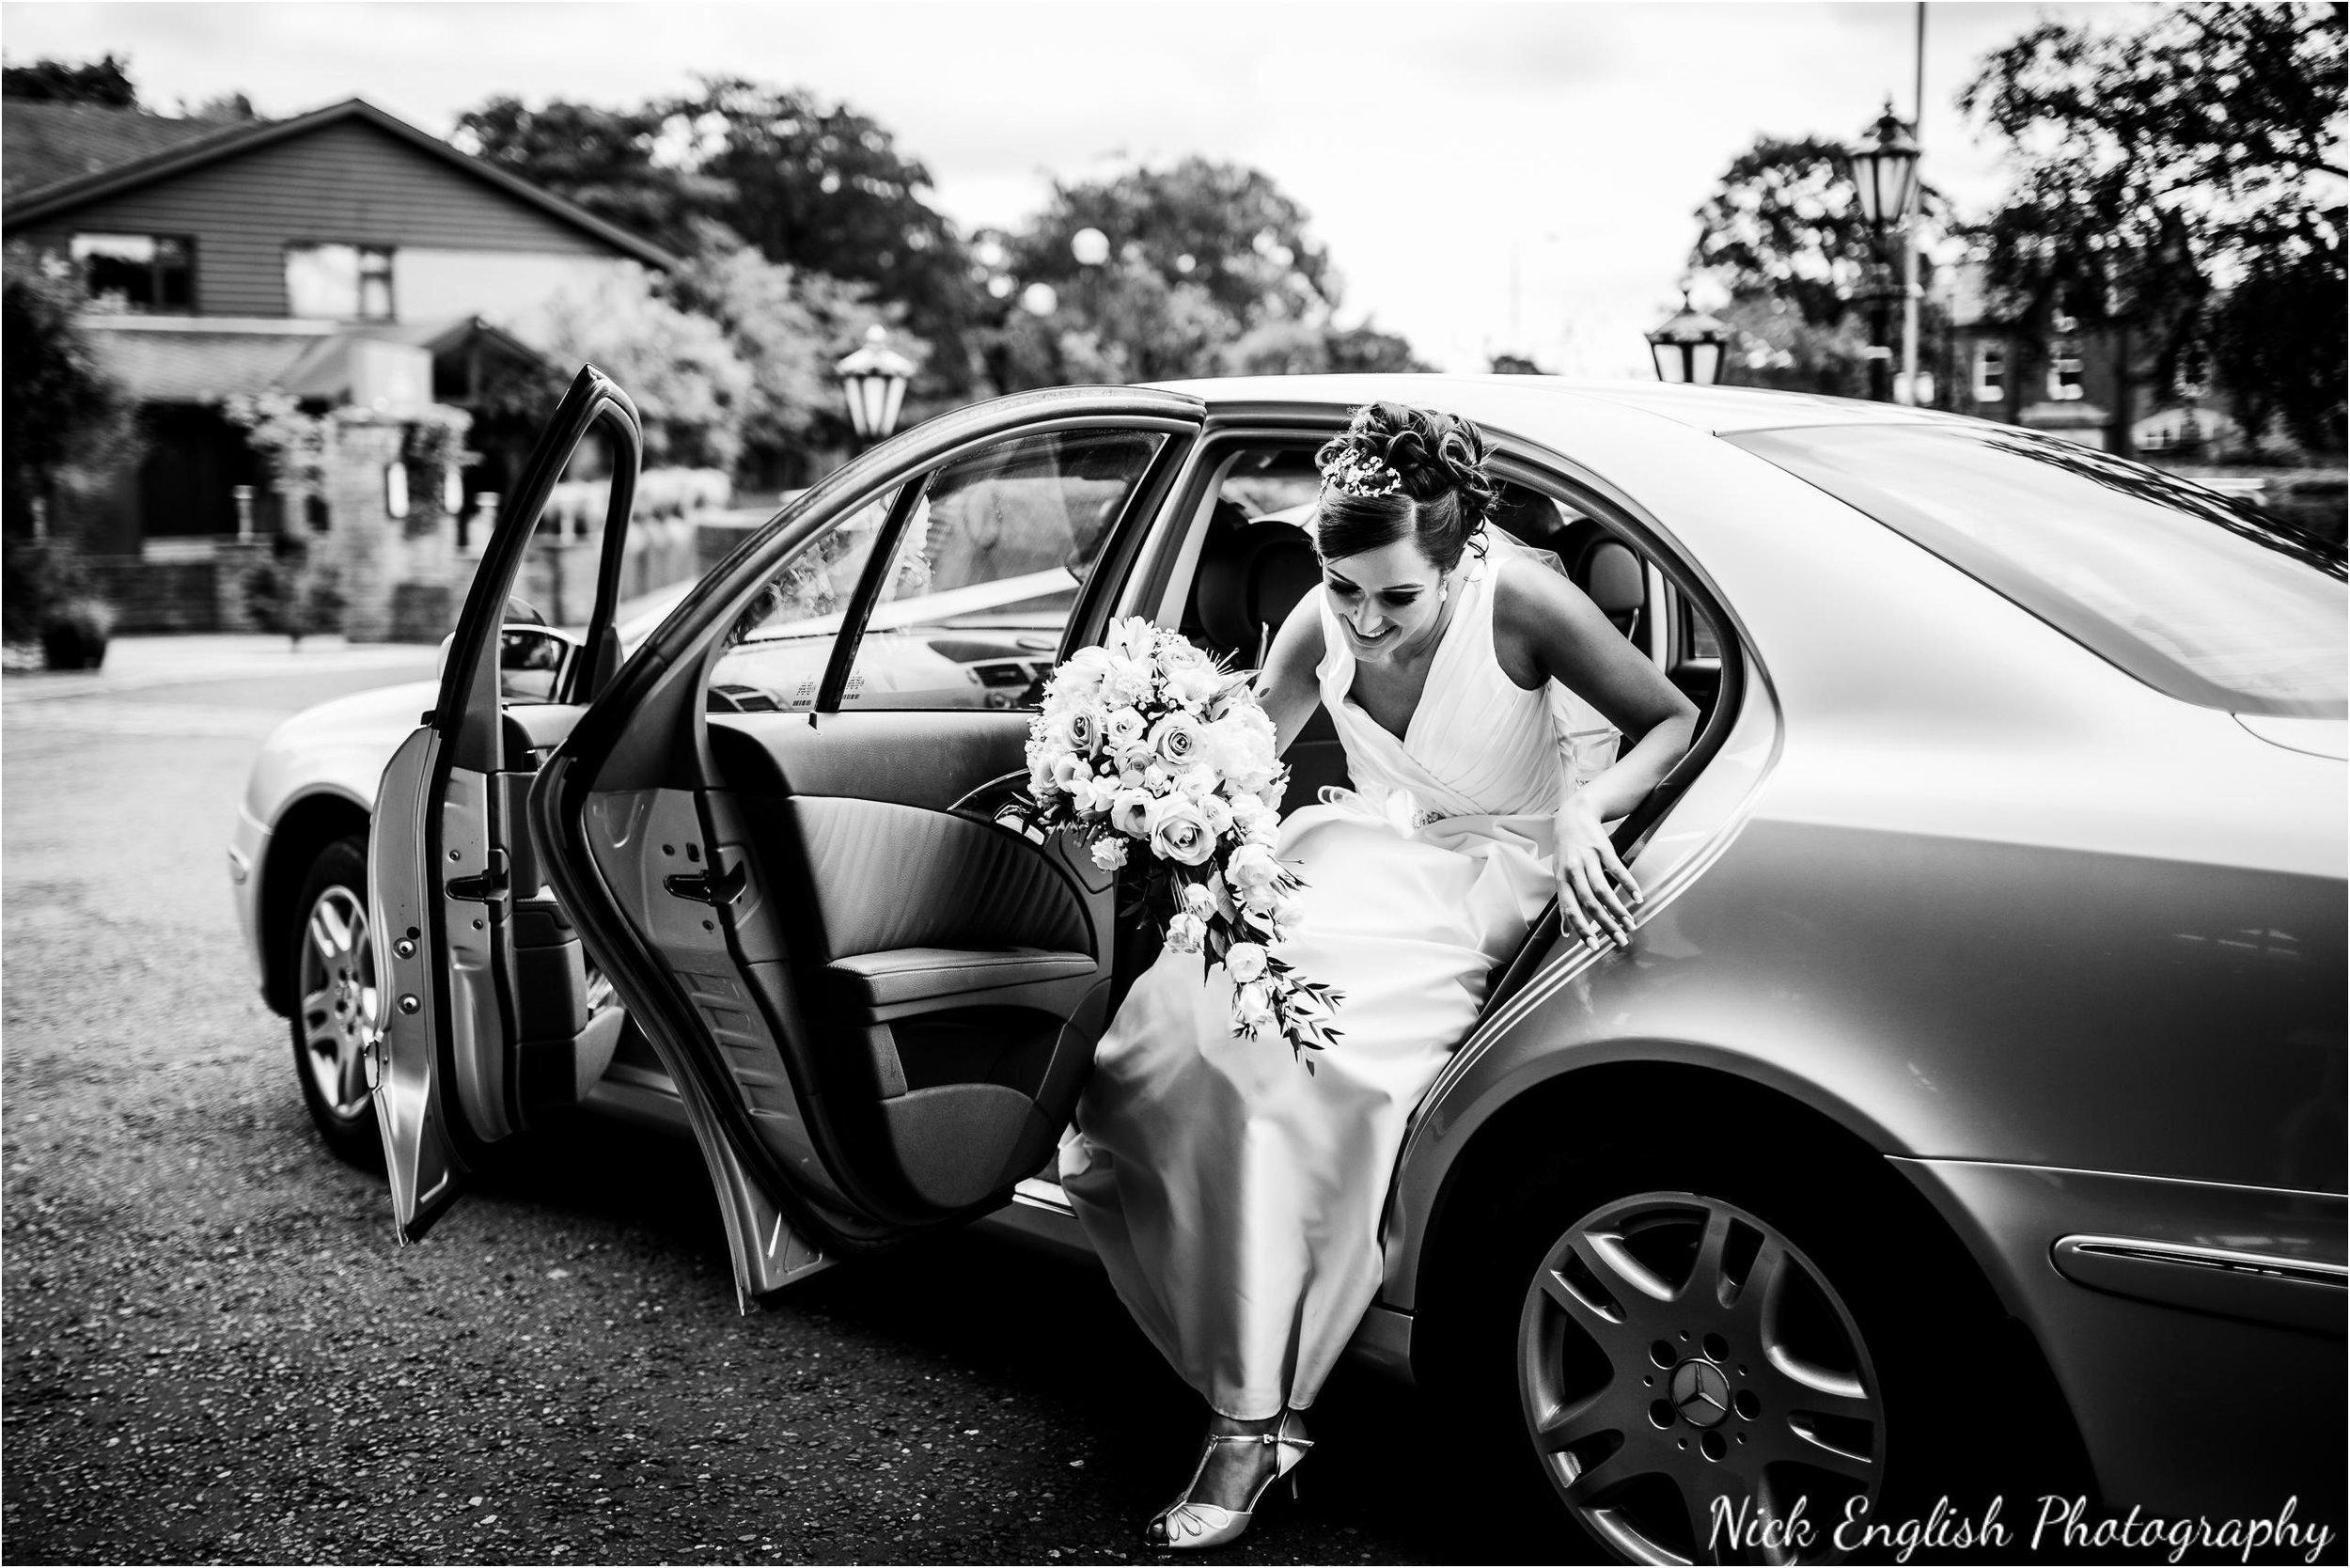 Emily David Wedding Photographs at Barton Grange Preston by Nick English Photography 49jpg.jpeg